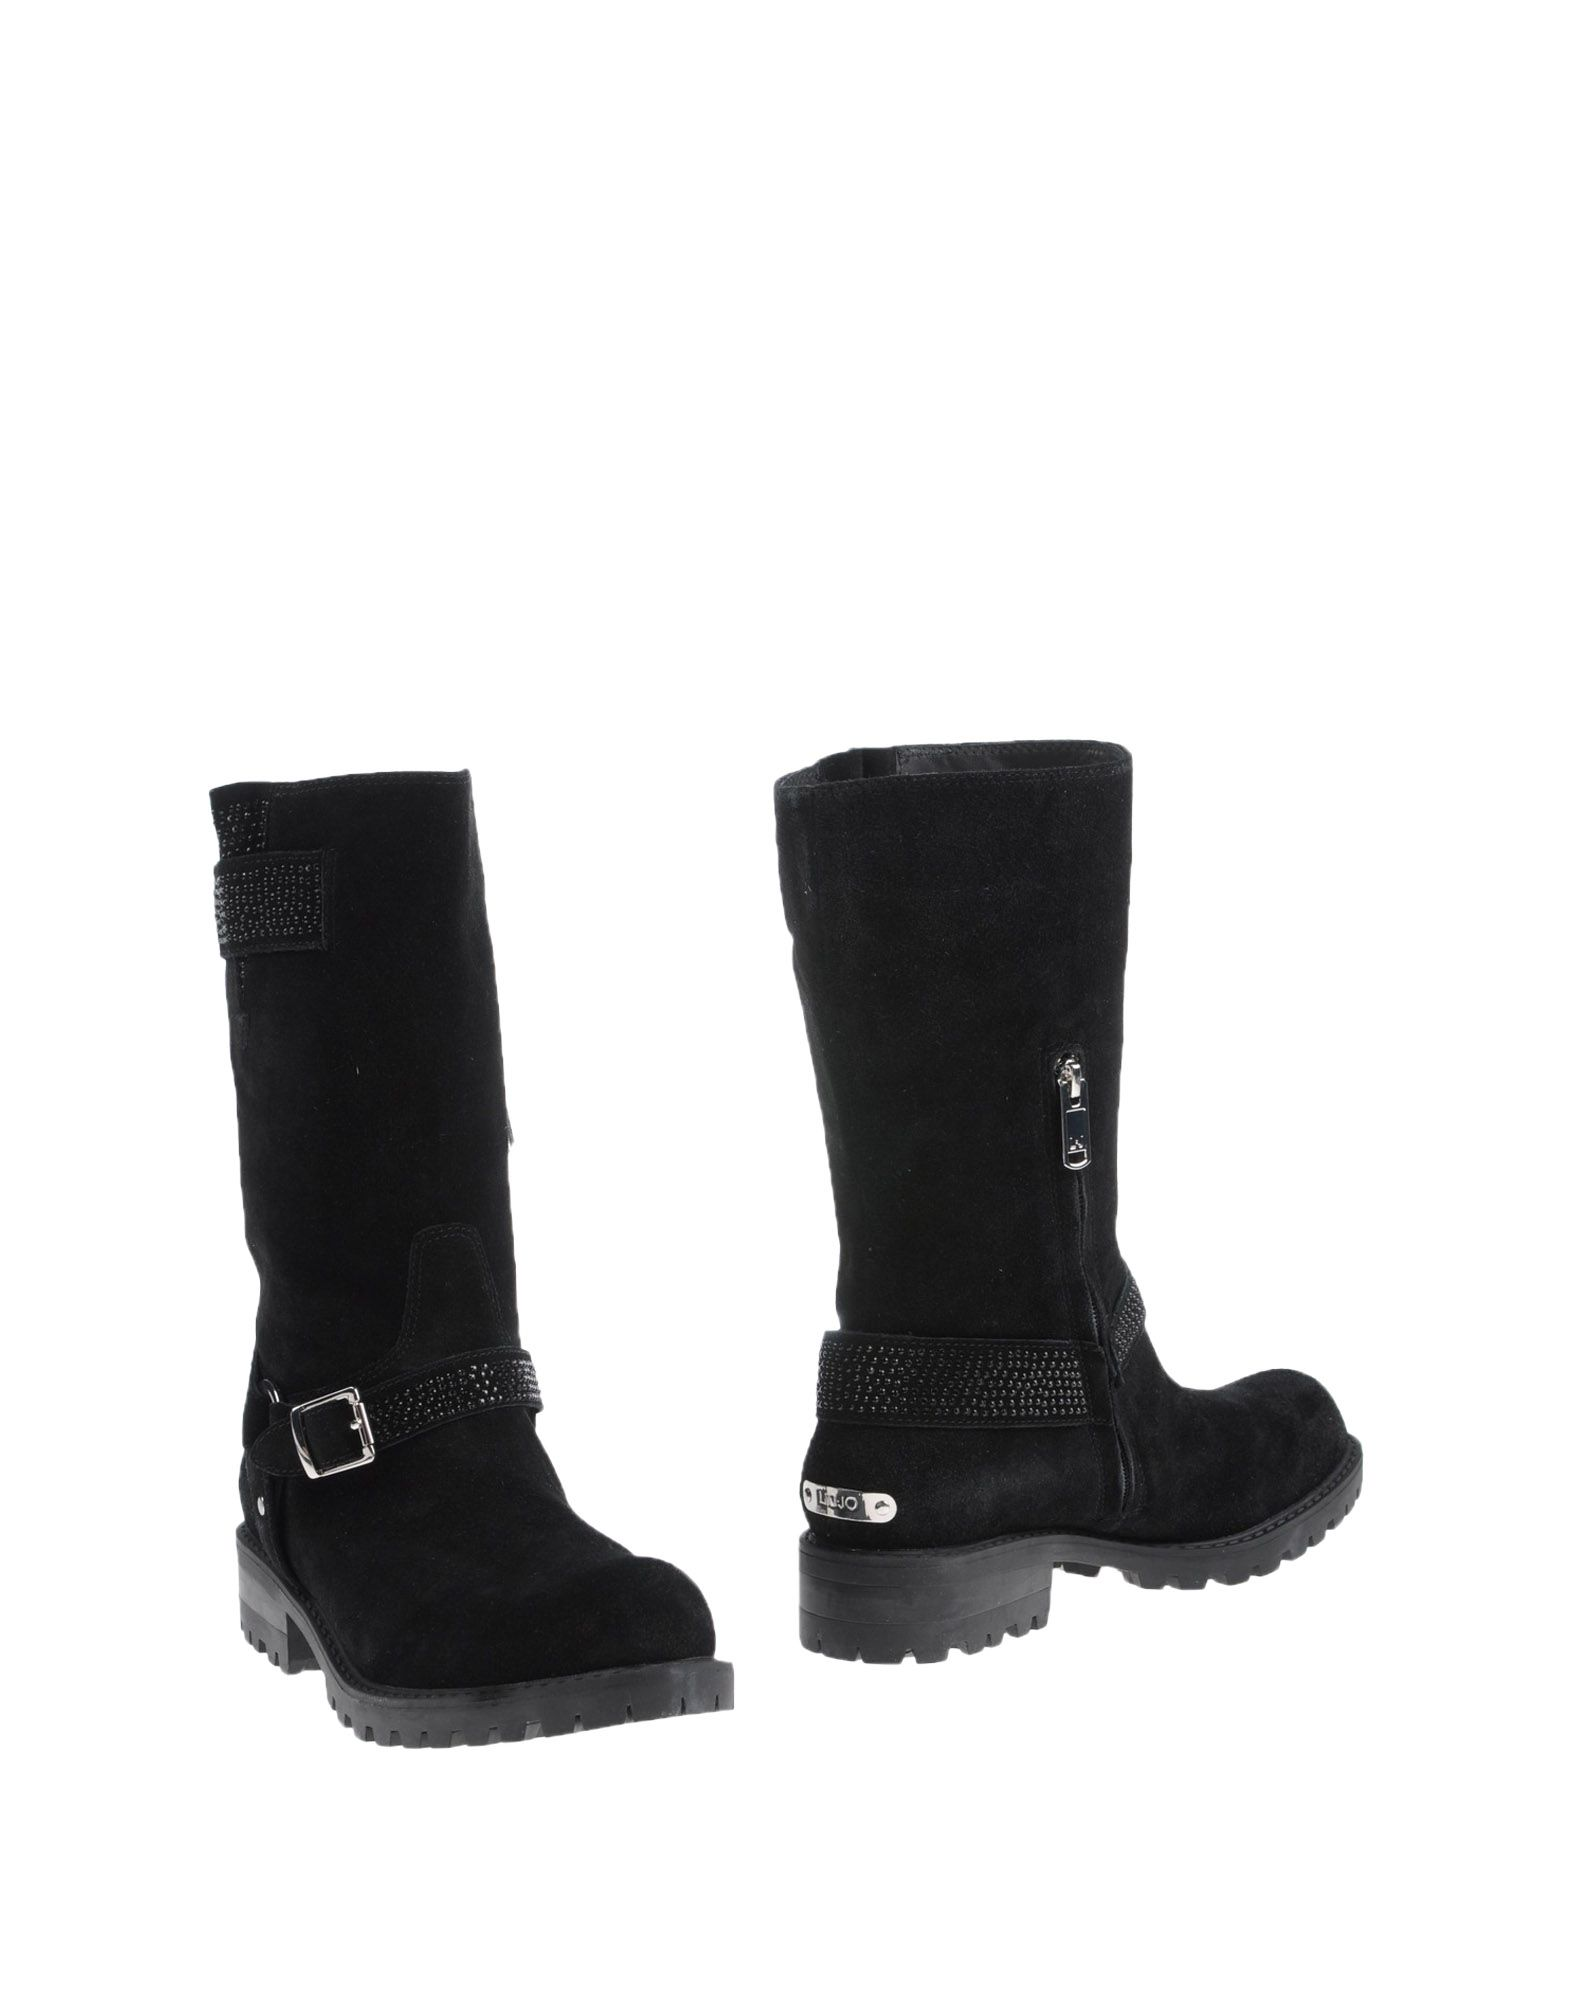 Liu •Jo Shoes Stiefelette Damen  Qualität 11163975EU Gute Qualität  beliebte Schuhe ee50e9